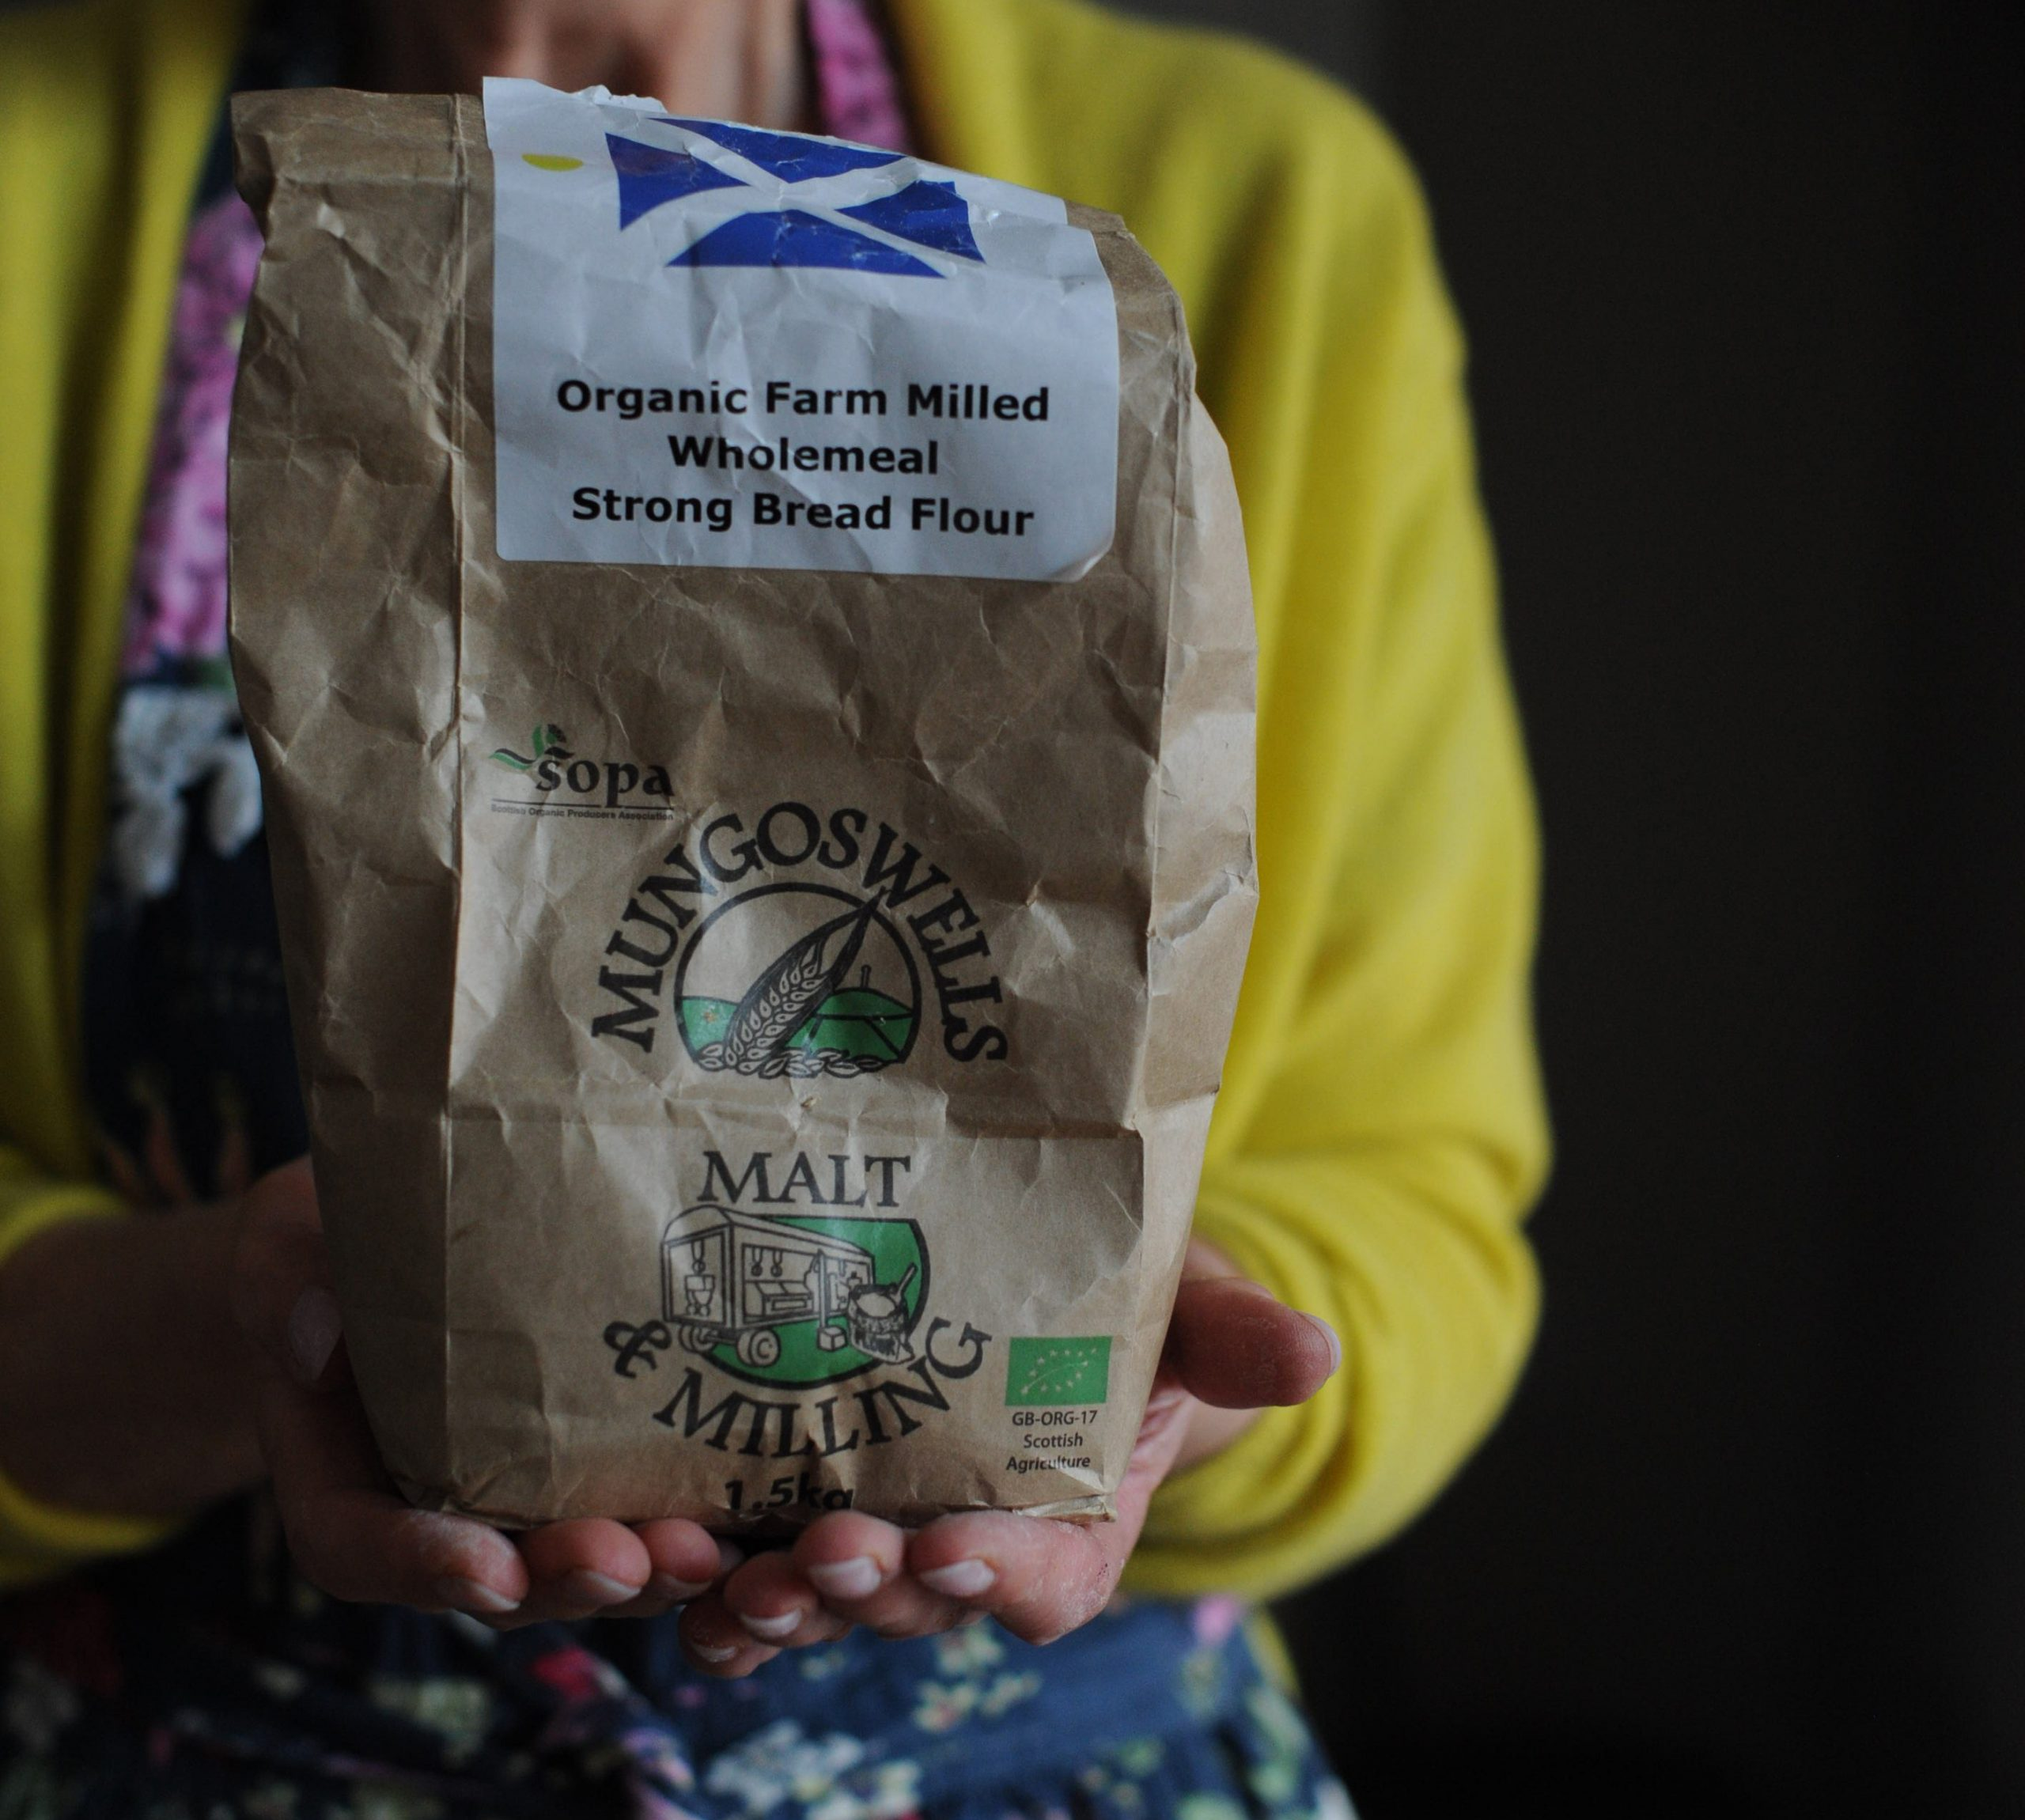 Mungoswells organic wholemeal bread flour